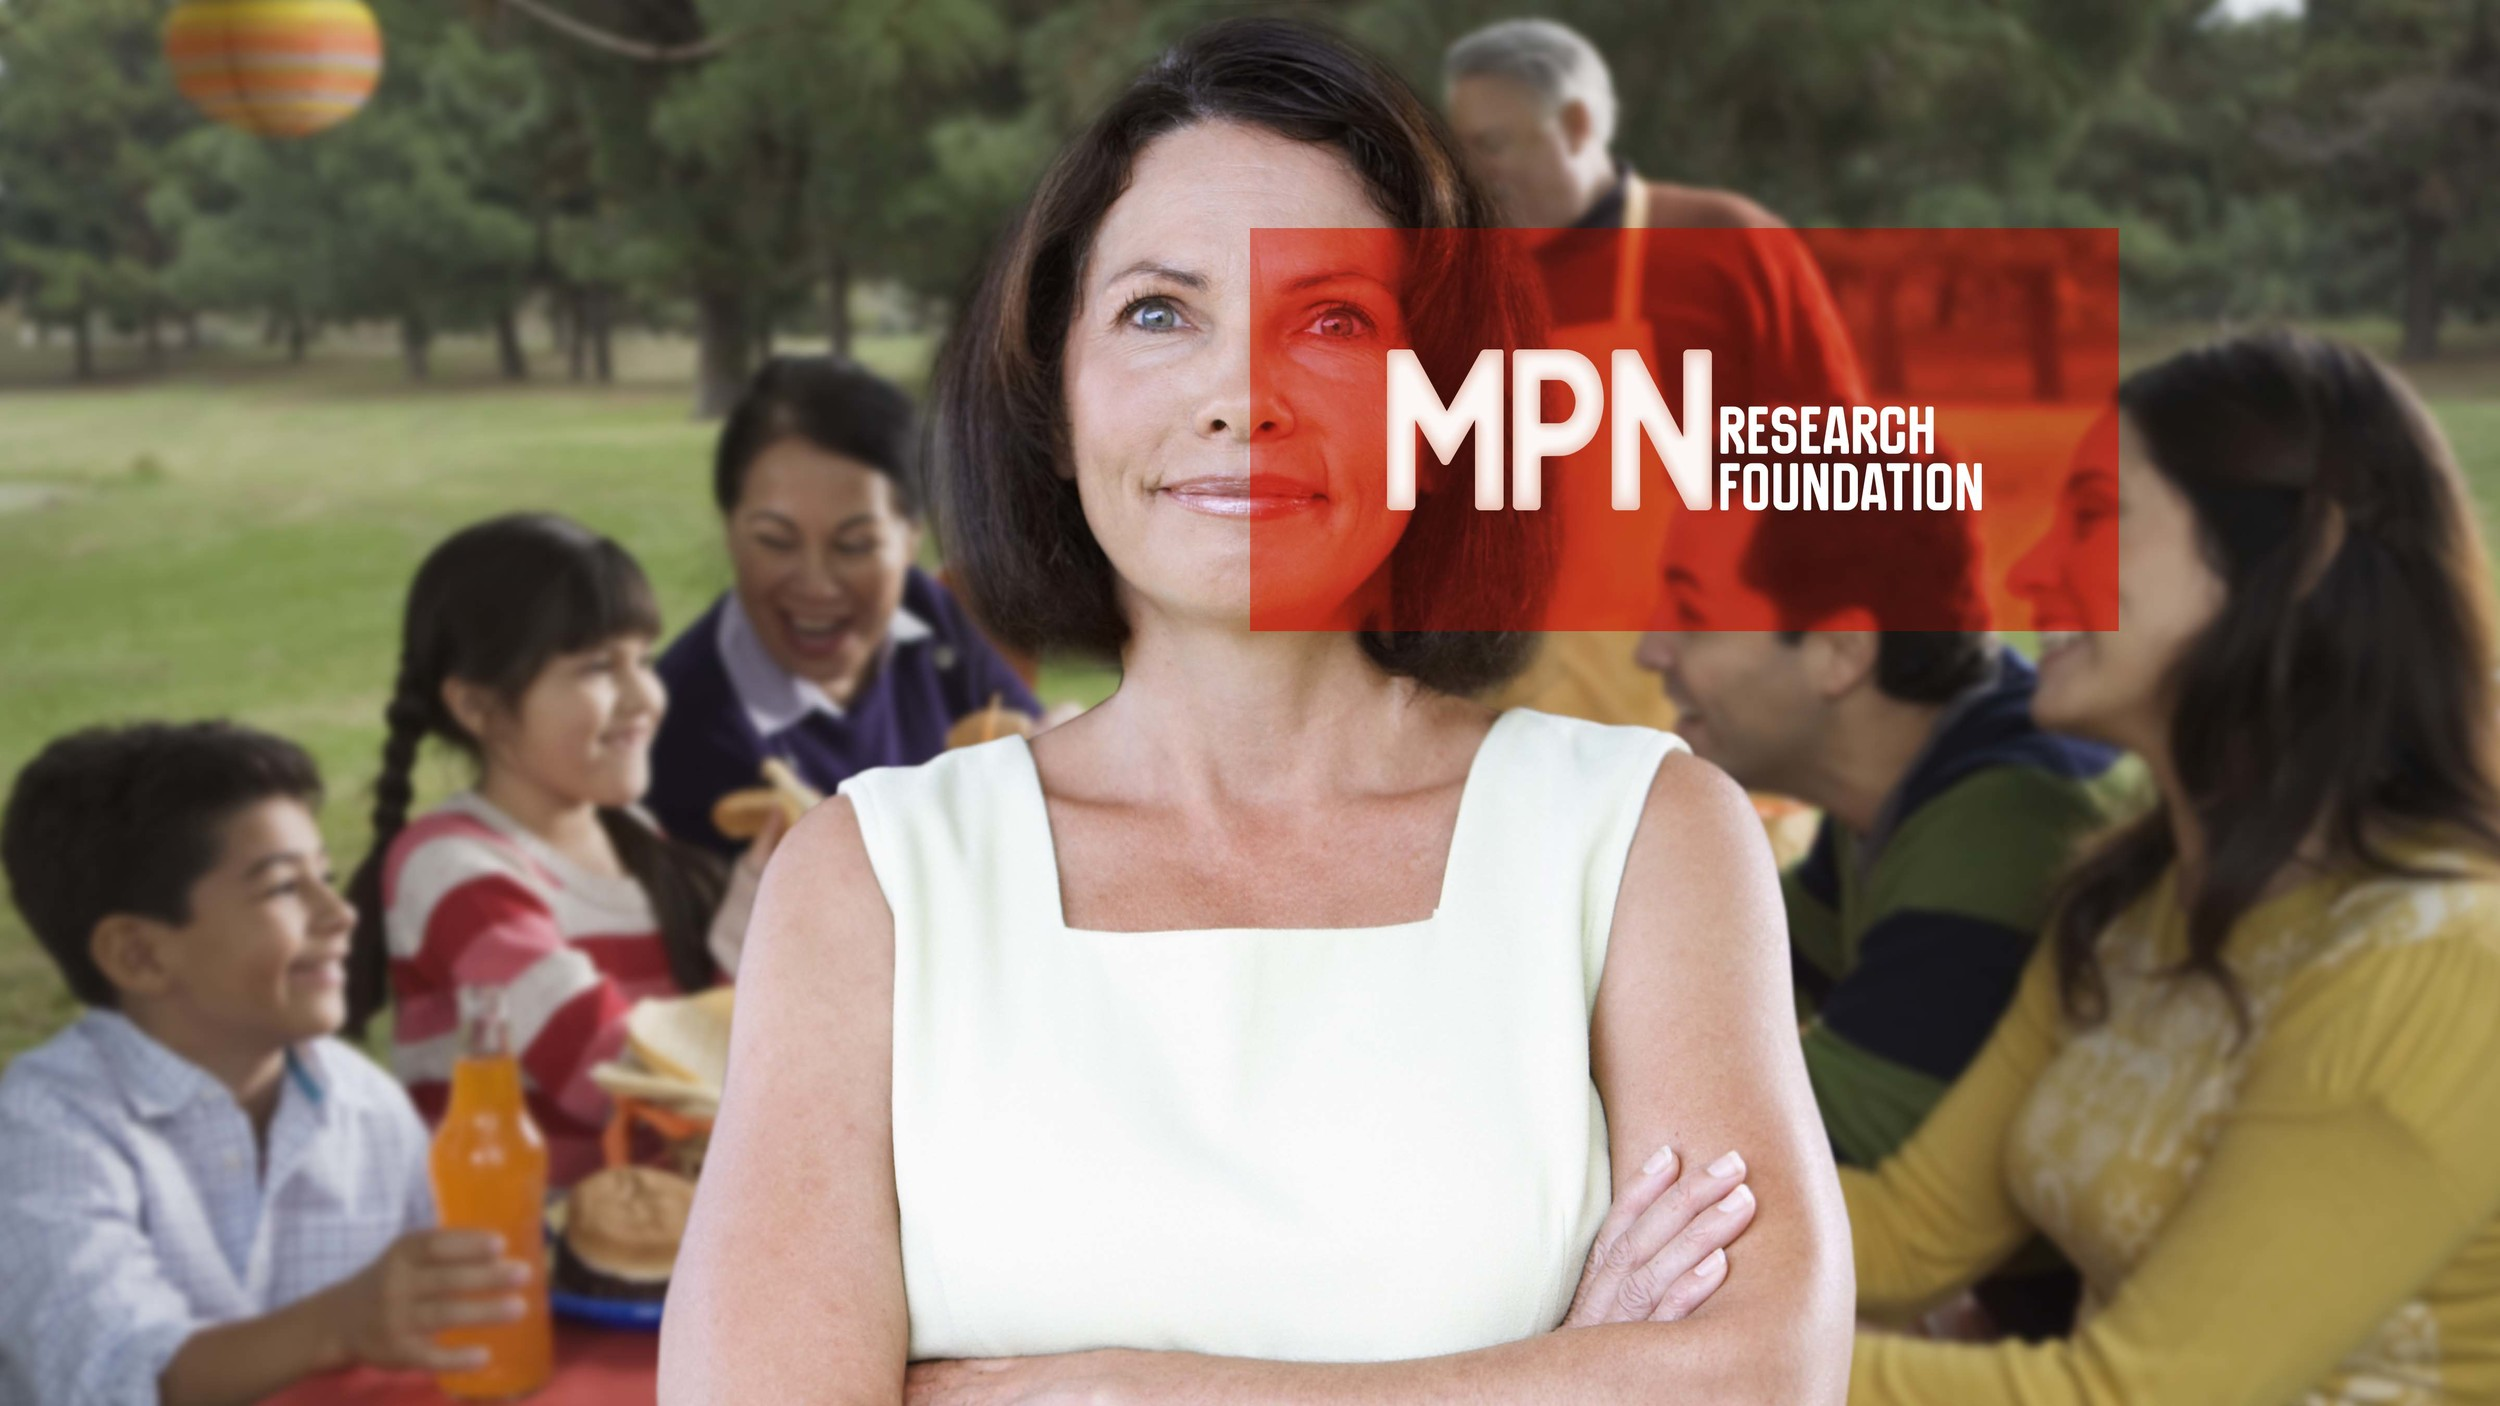 MPN_Creative_7.jpg